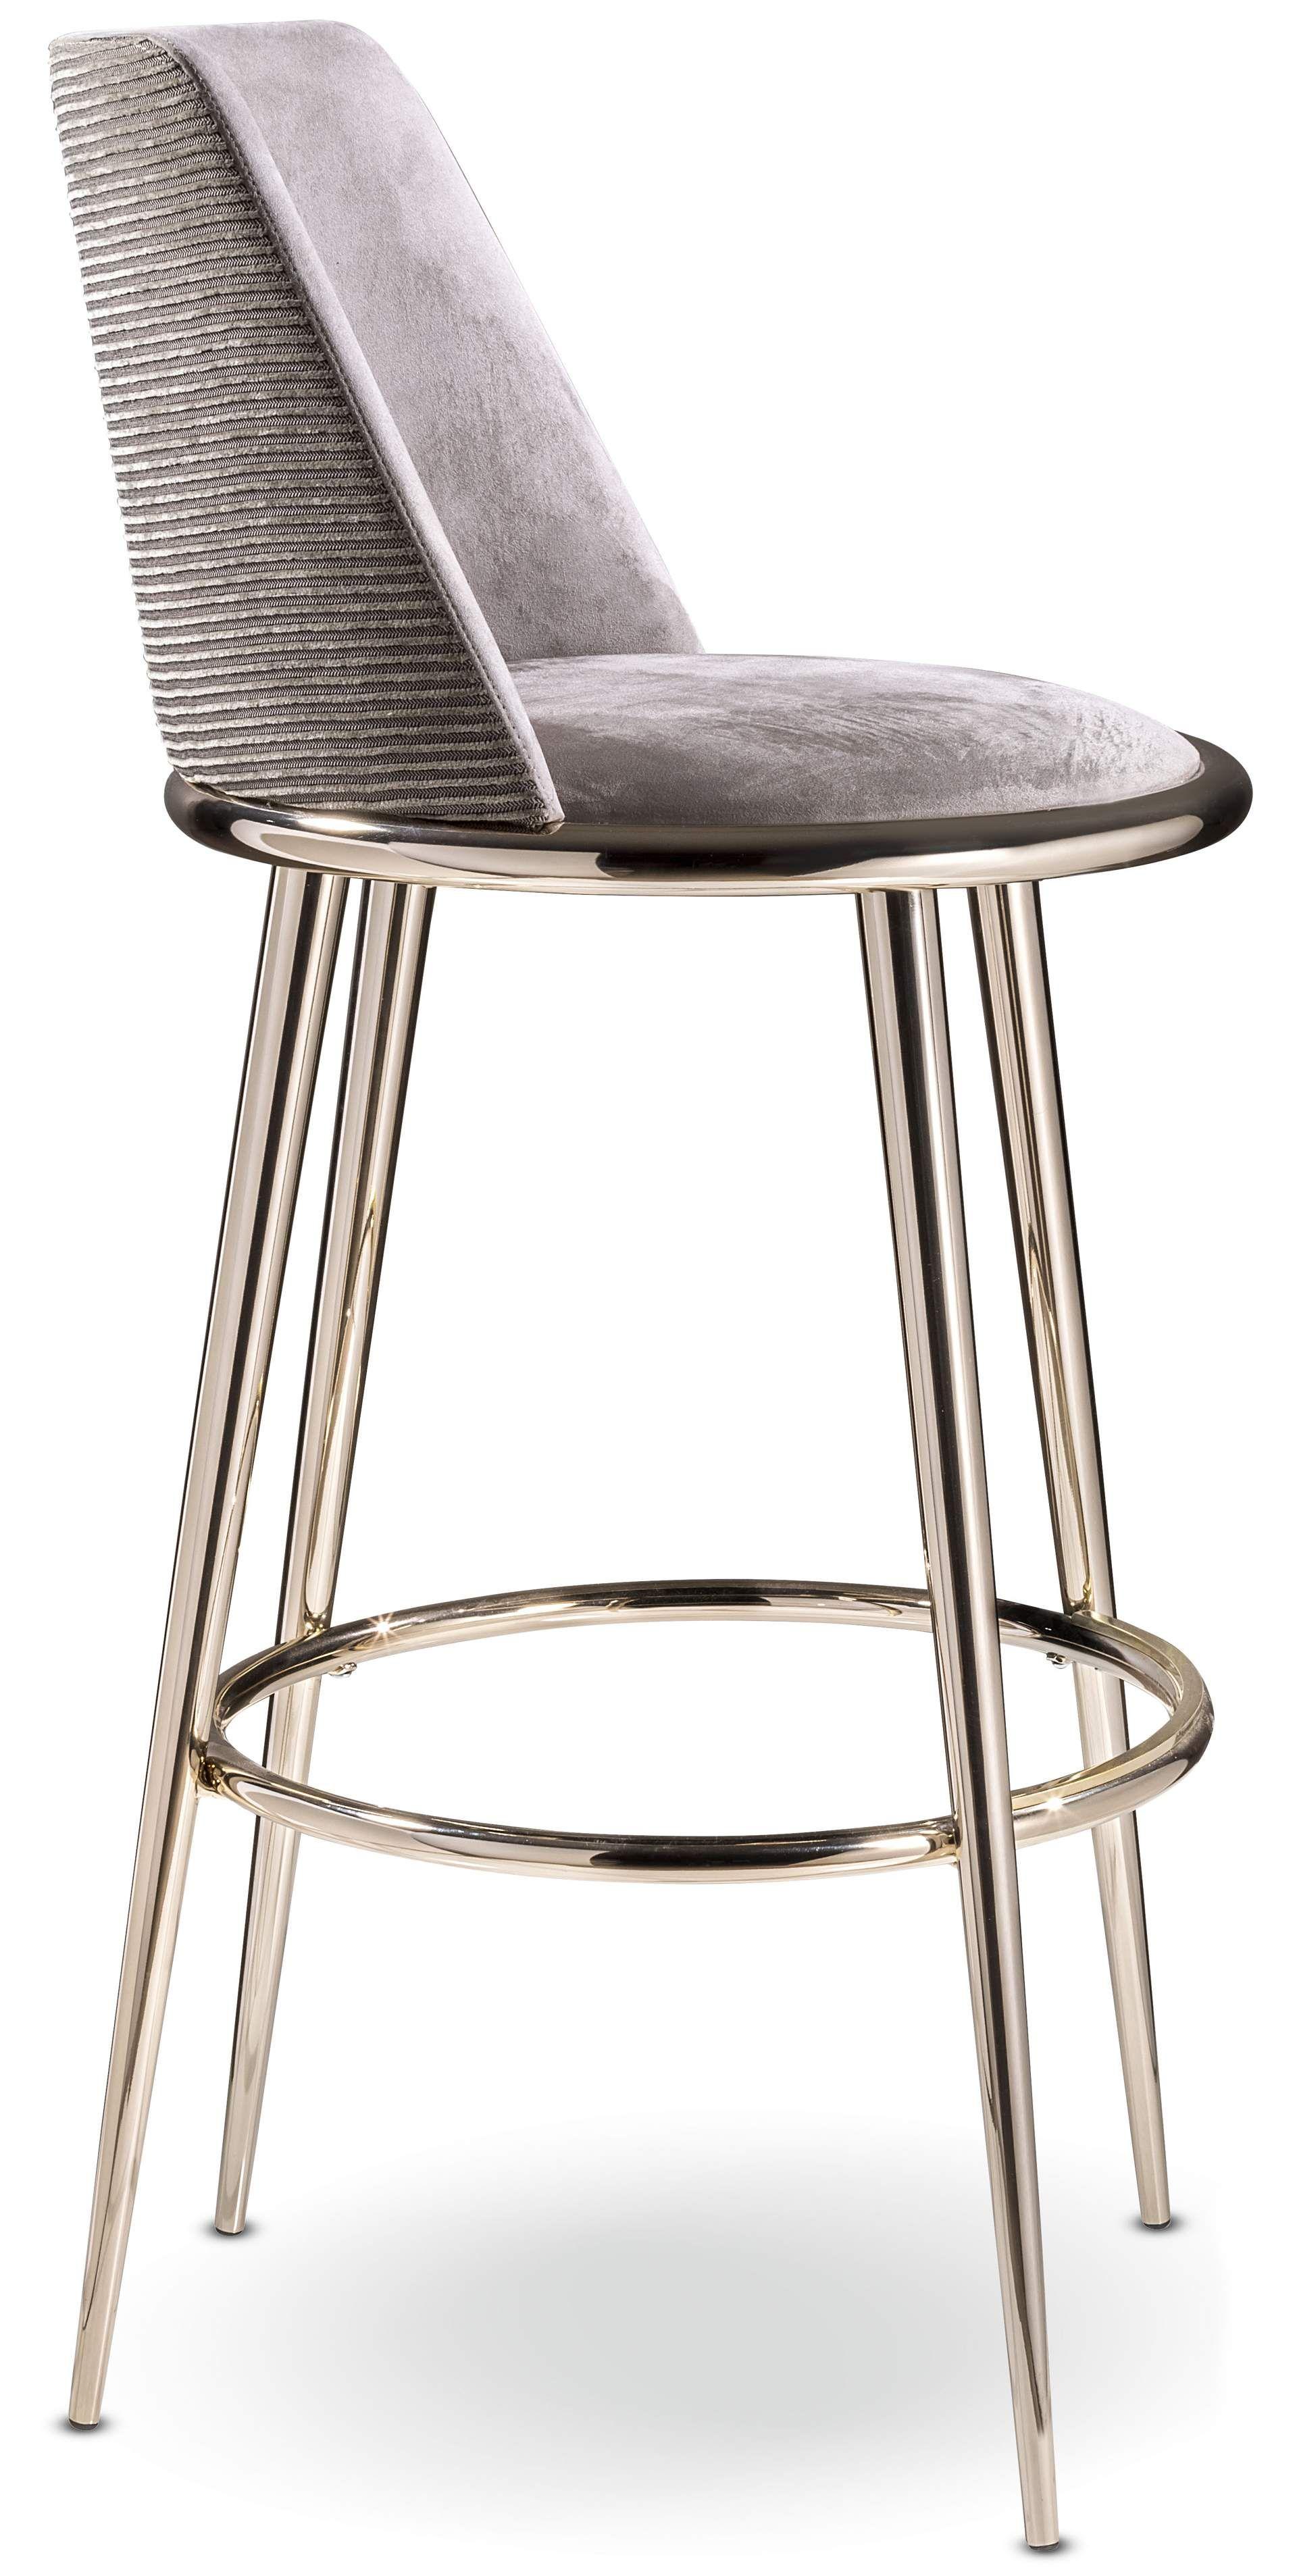 Aurora Padded Stool Cantori Italy Furniture Dining Chairs Stool Designer Bar Stools